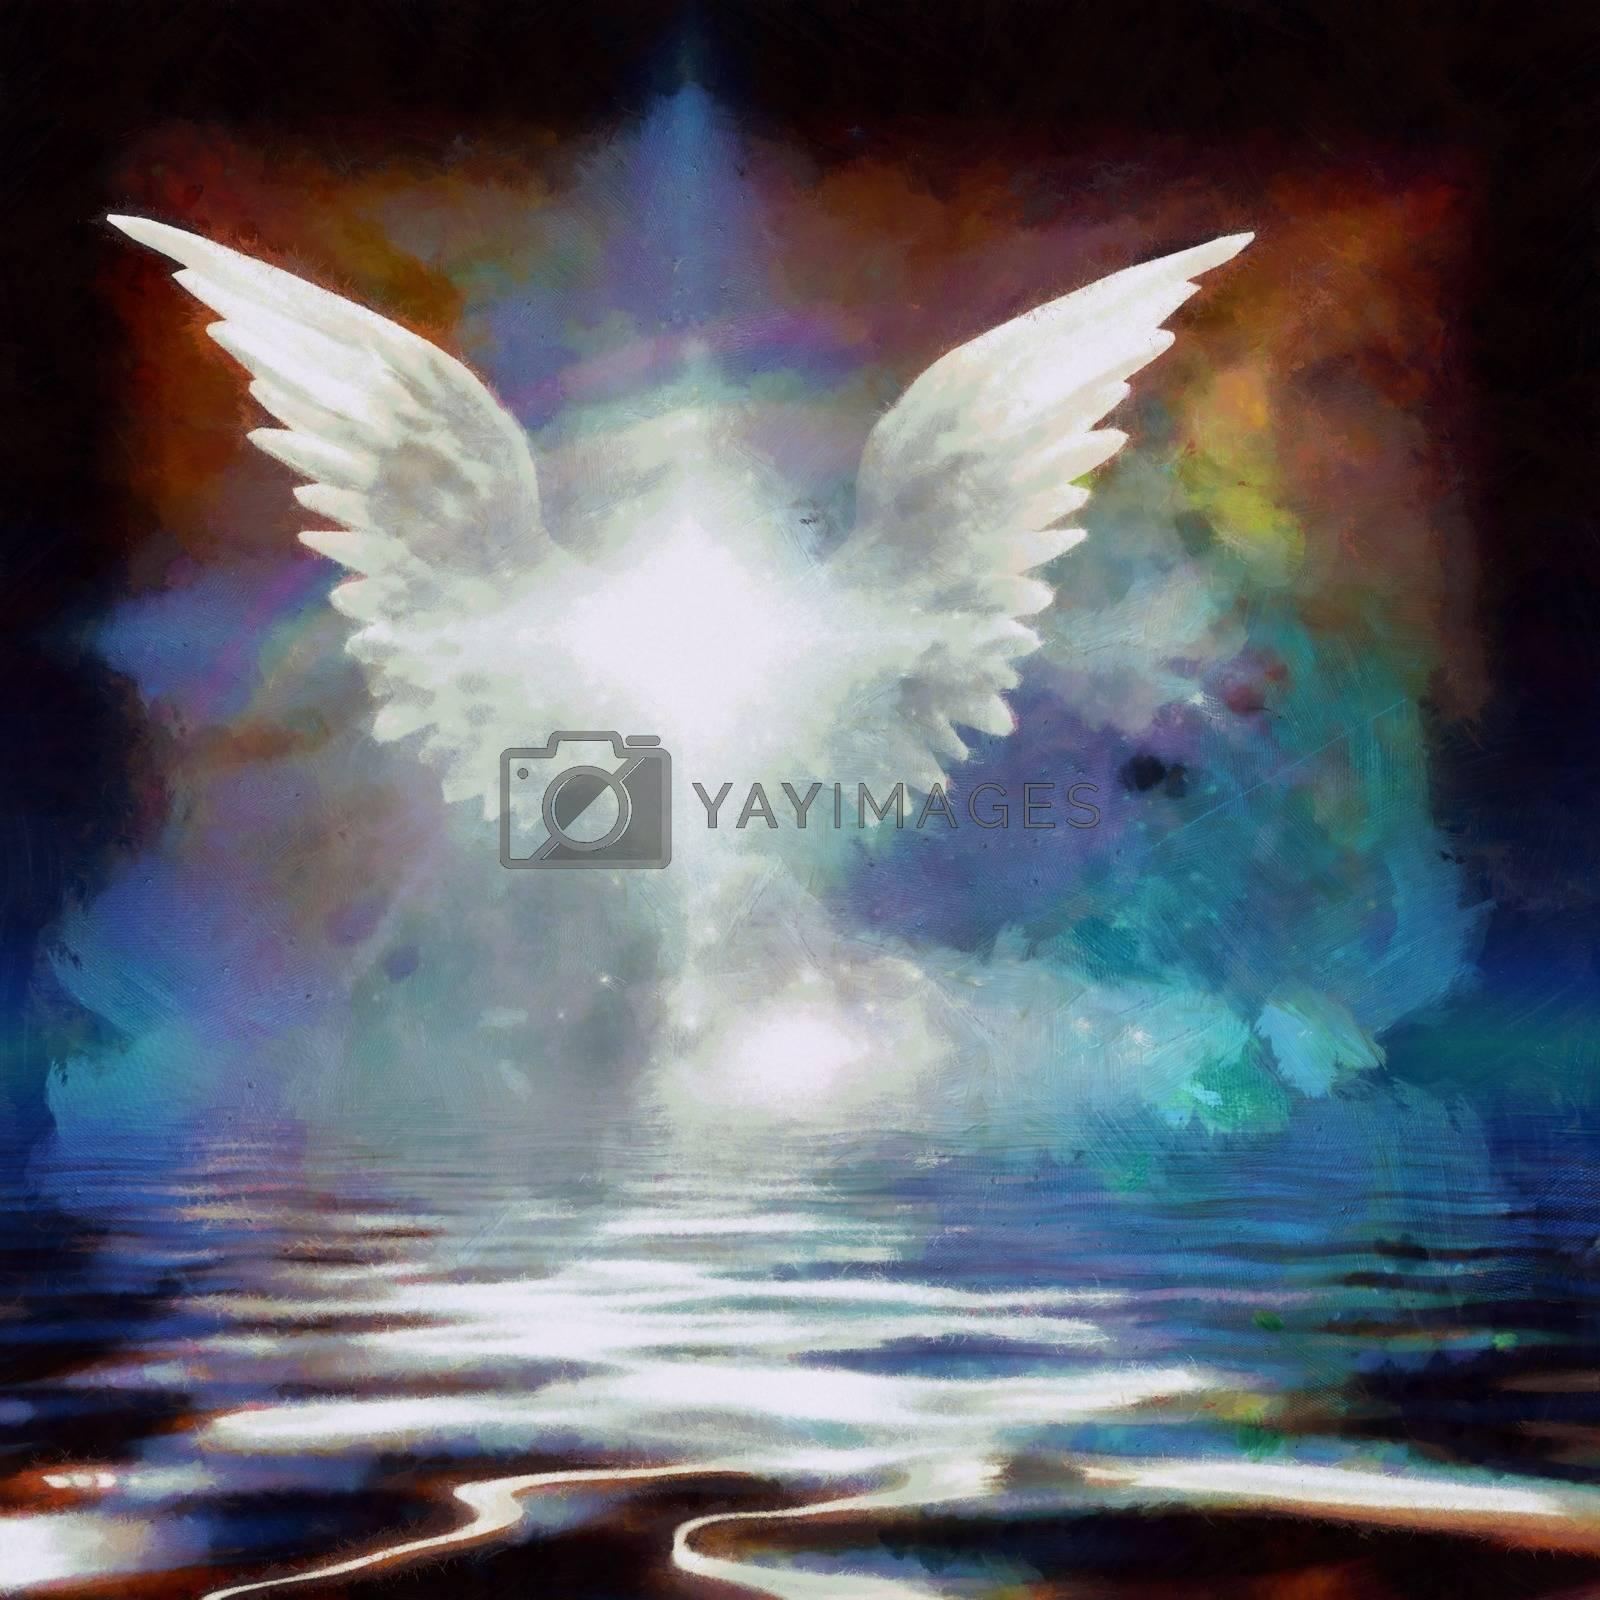 Wings over water Drawing. 3D rendering